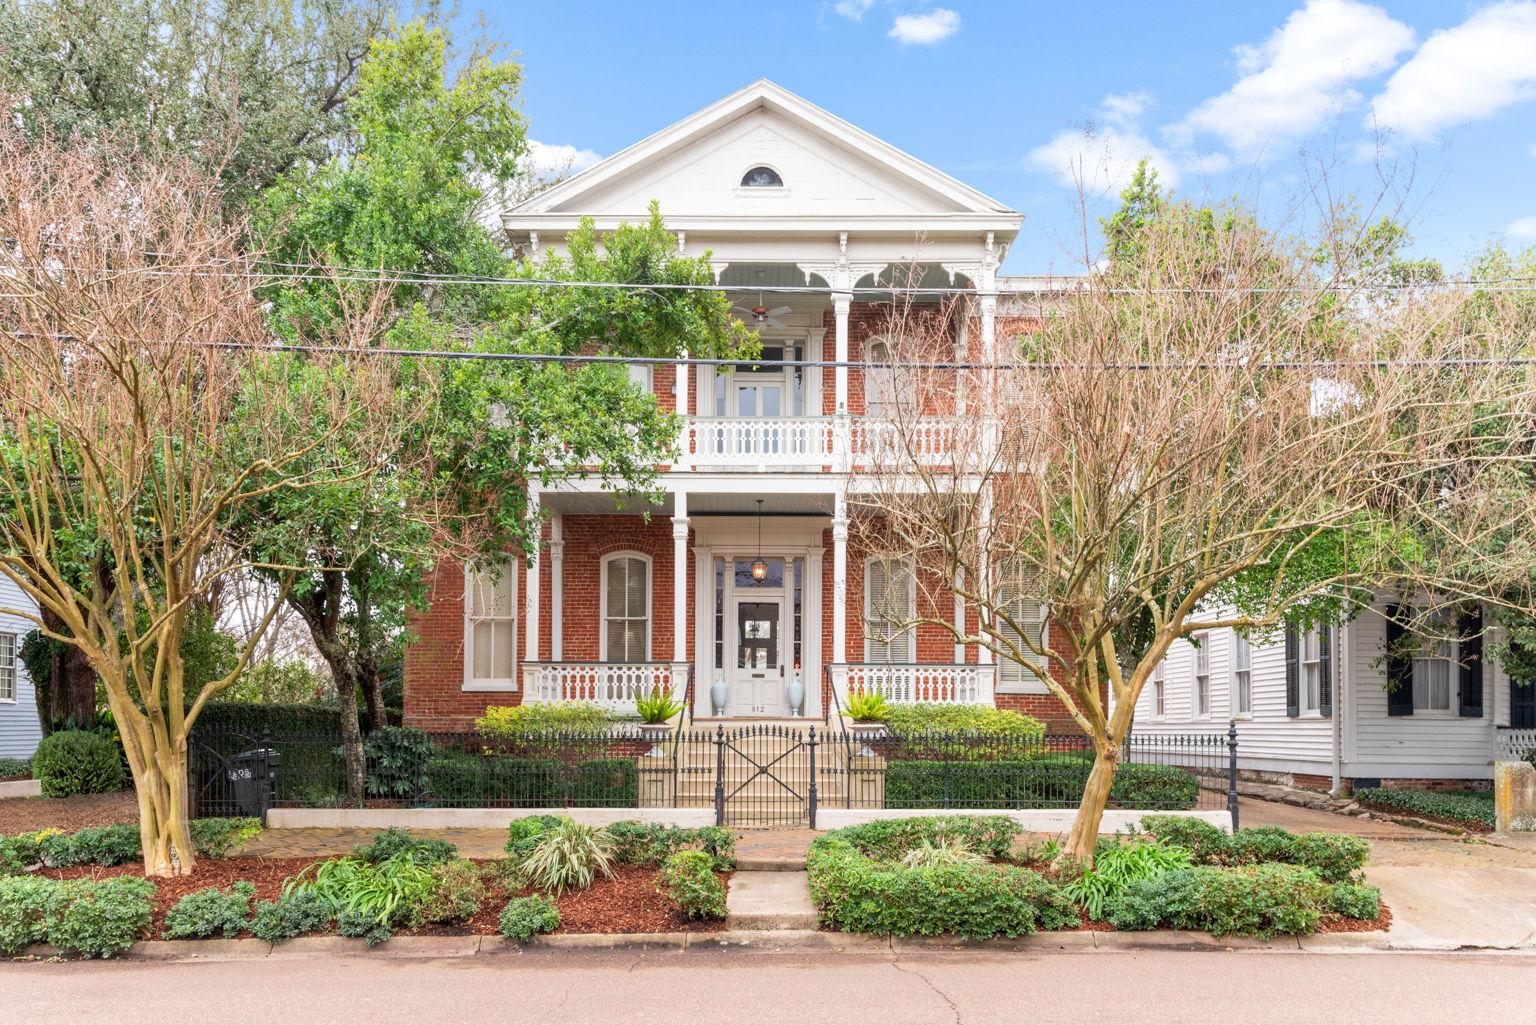 812 Main is a Classic 1880 Italianate brick home